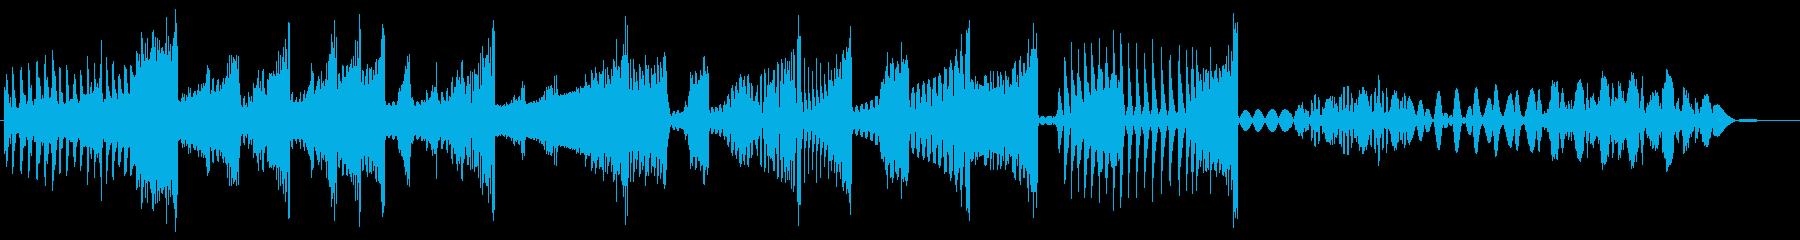 DJ REWIND INHALERの再生済みの波形